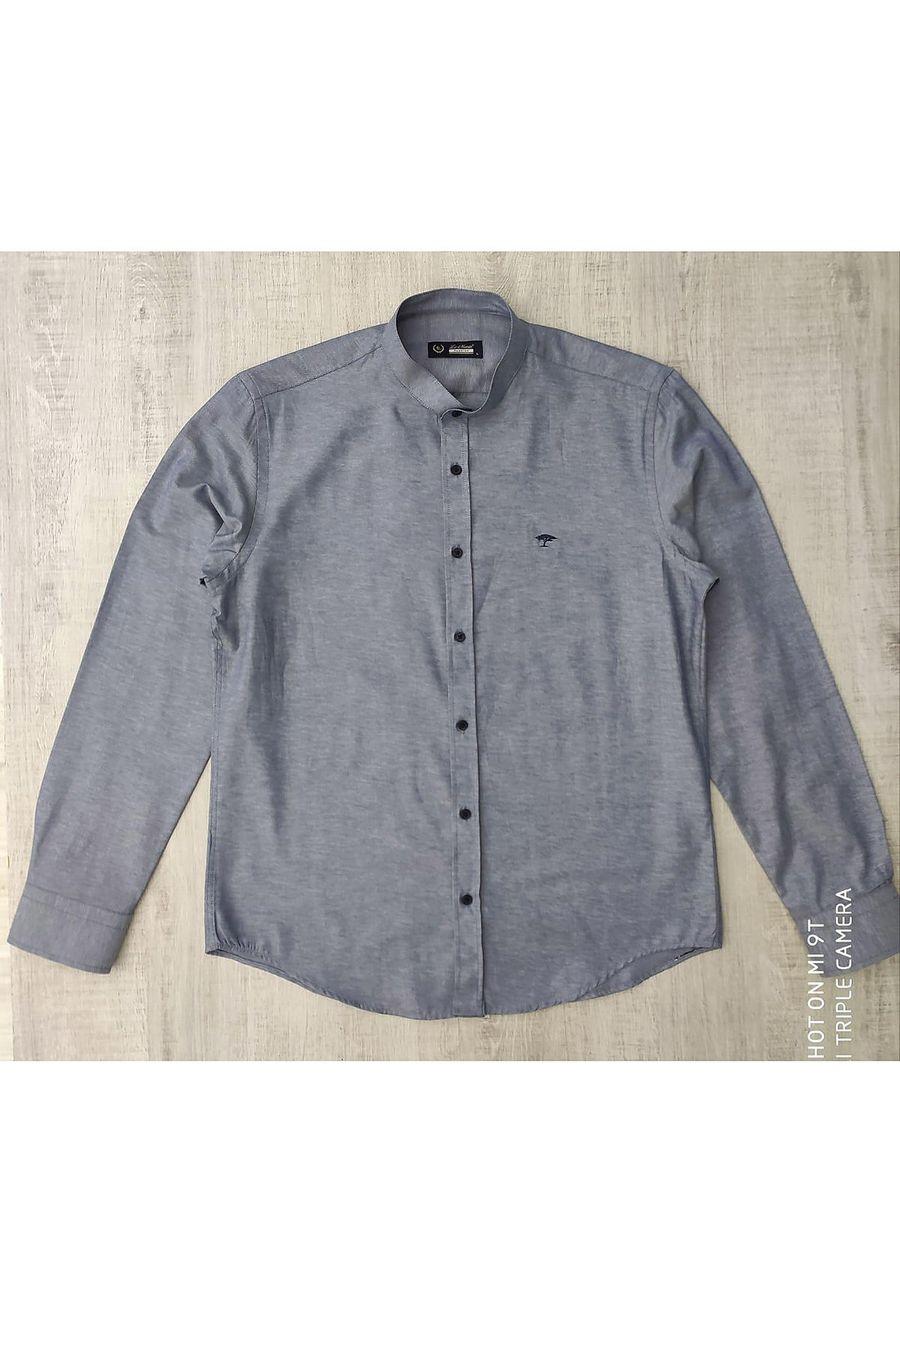 Рубашка мужская Le Marin 301-1 - фото 1